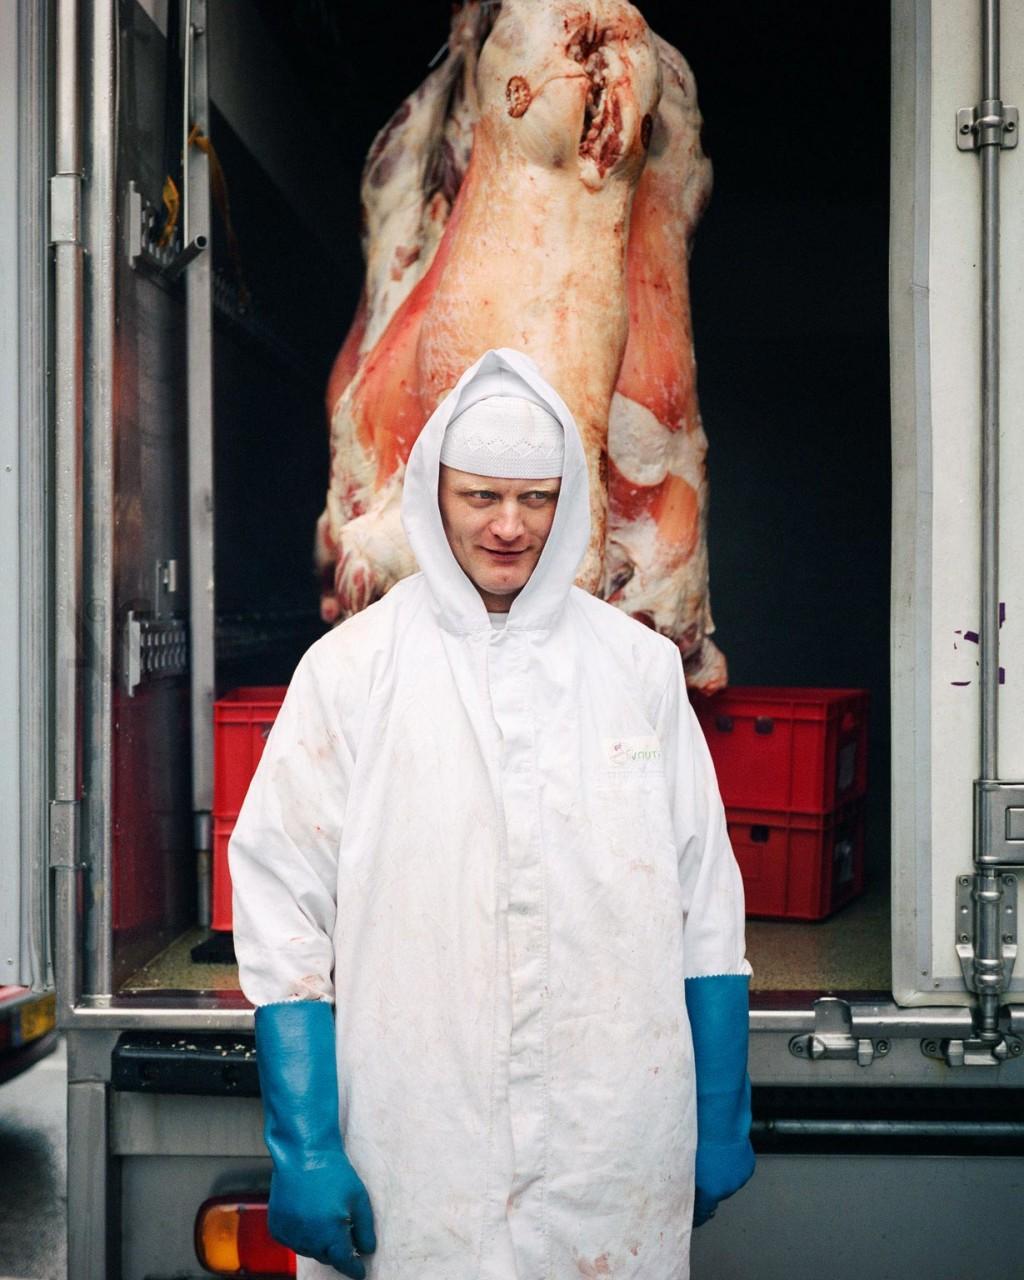 Halal butcher, 2008